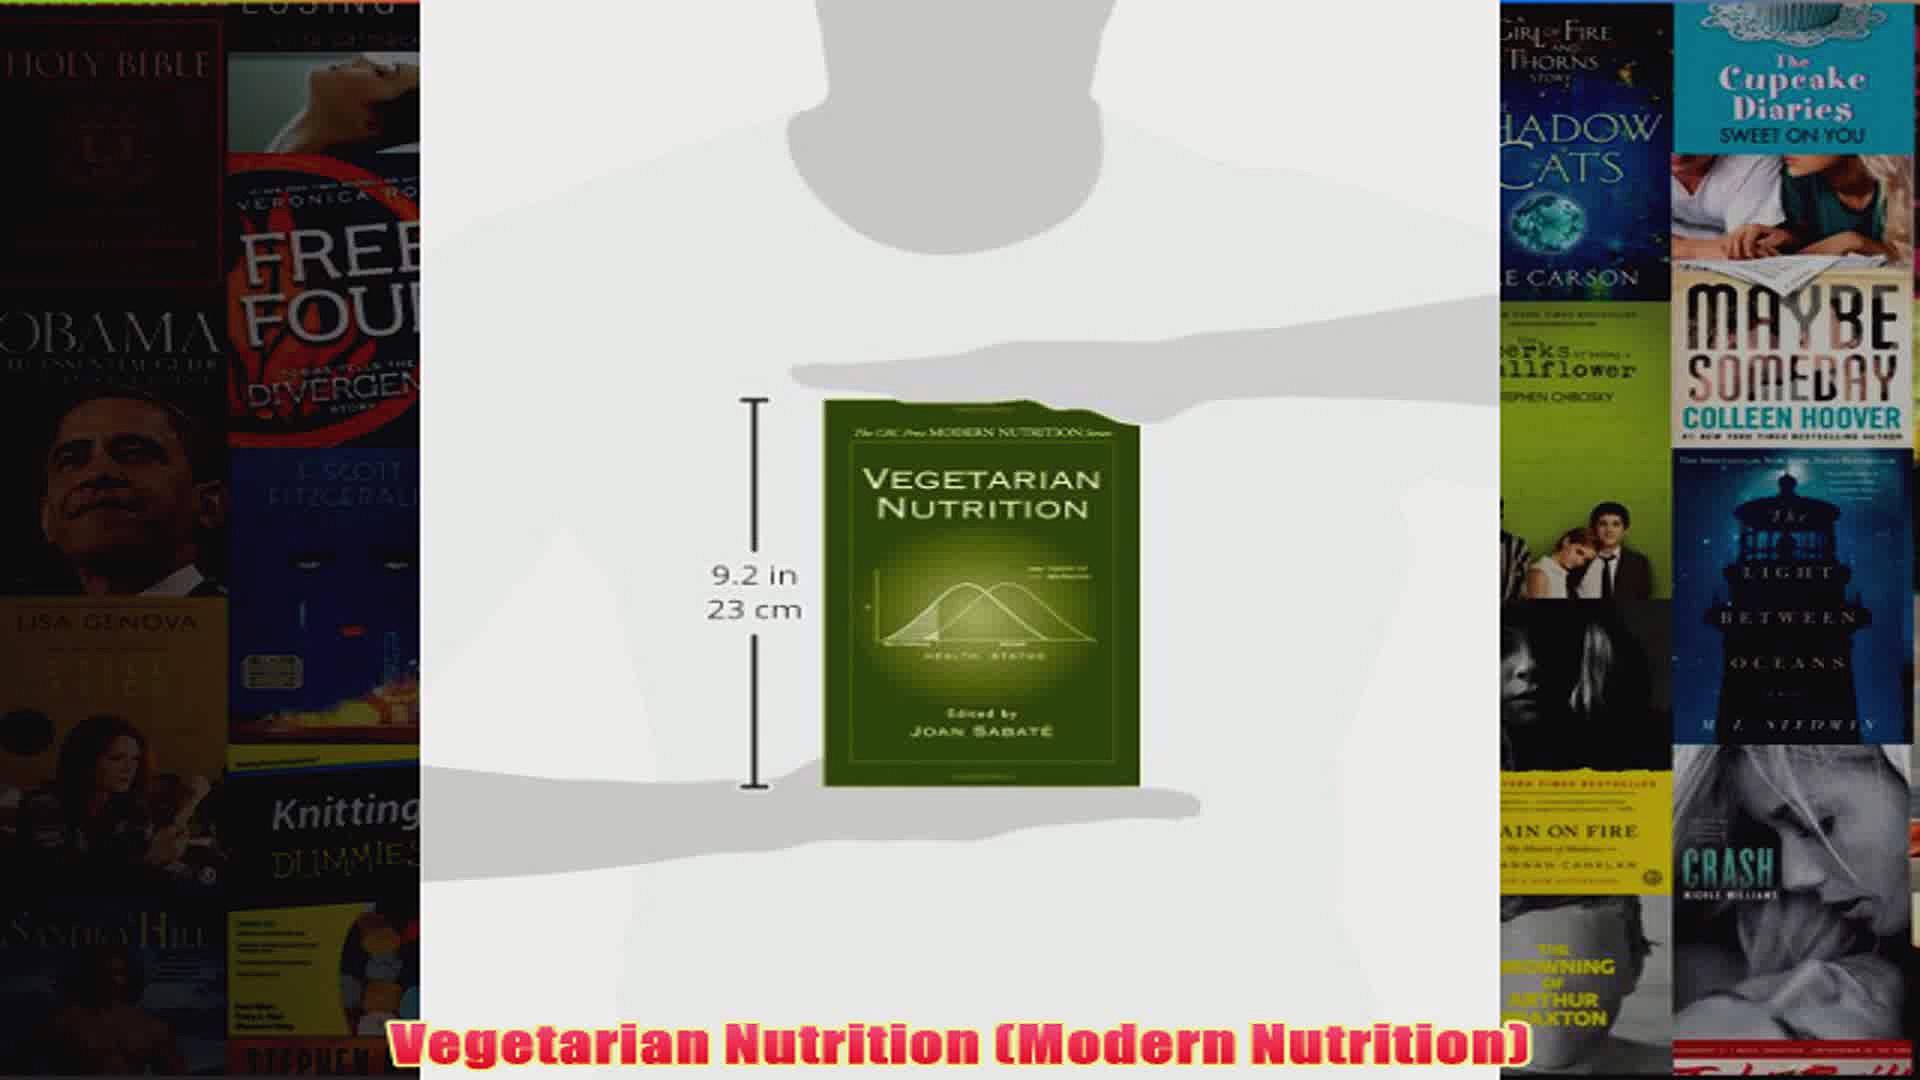 Vegetarian Nutrition Modern Nutrition